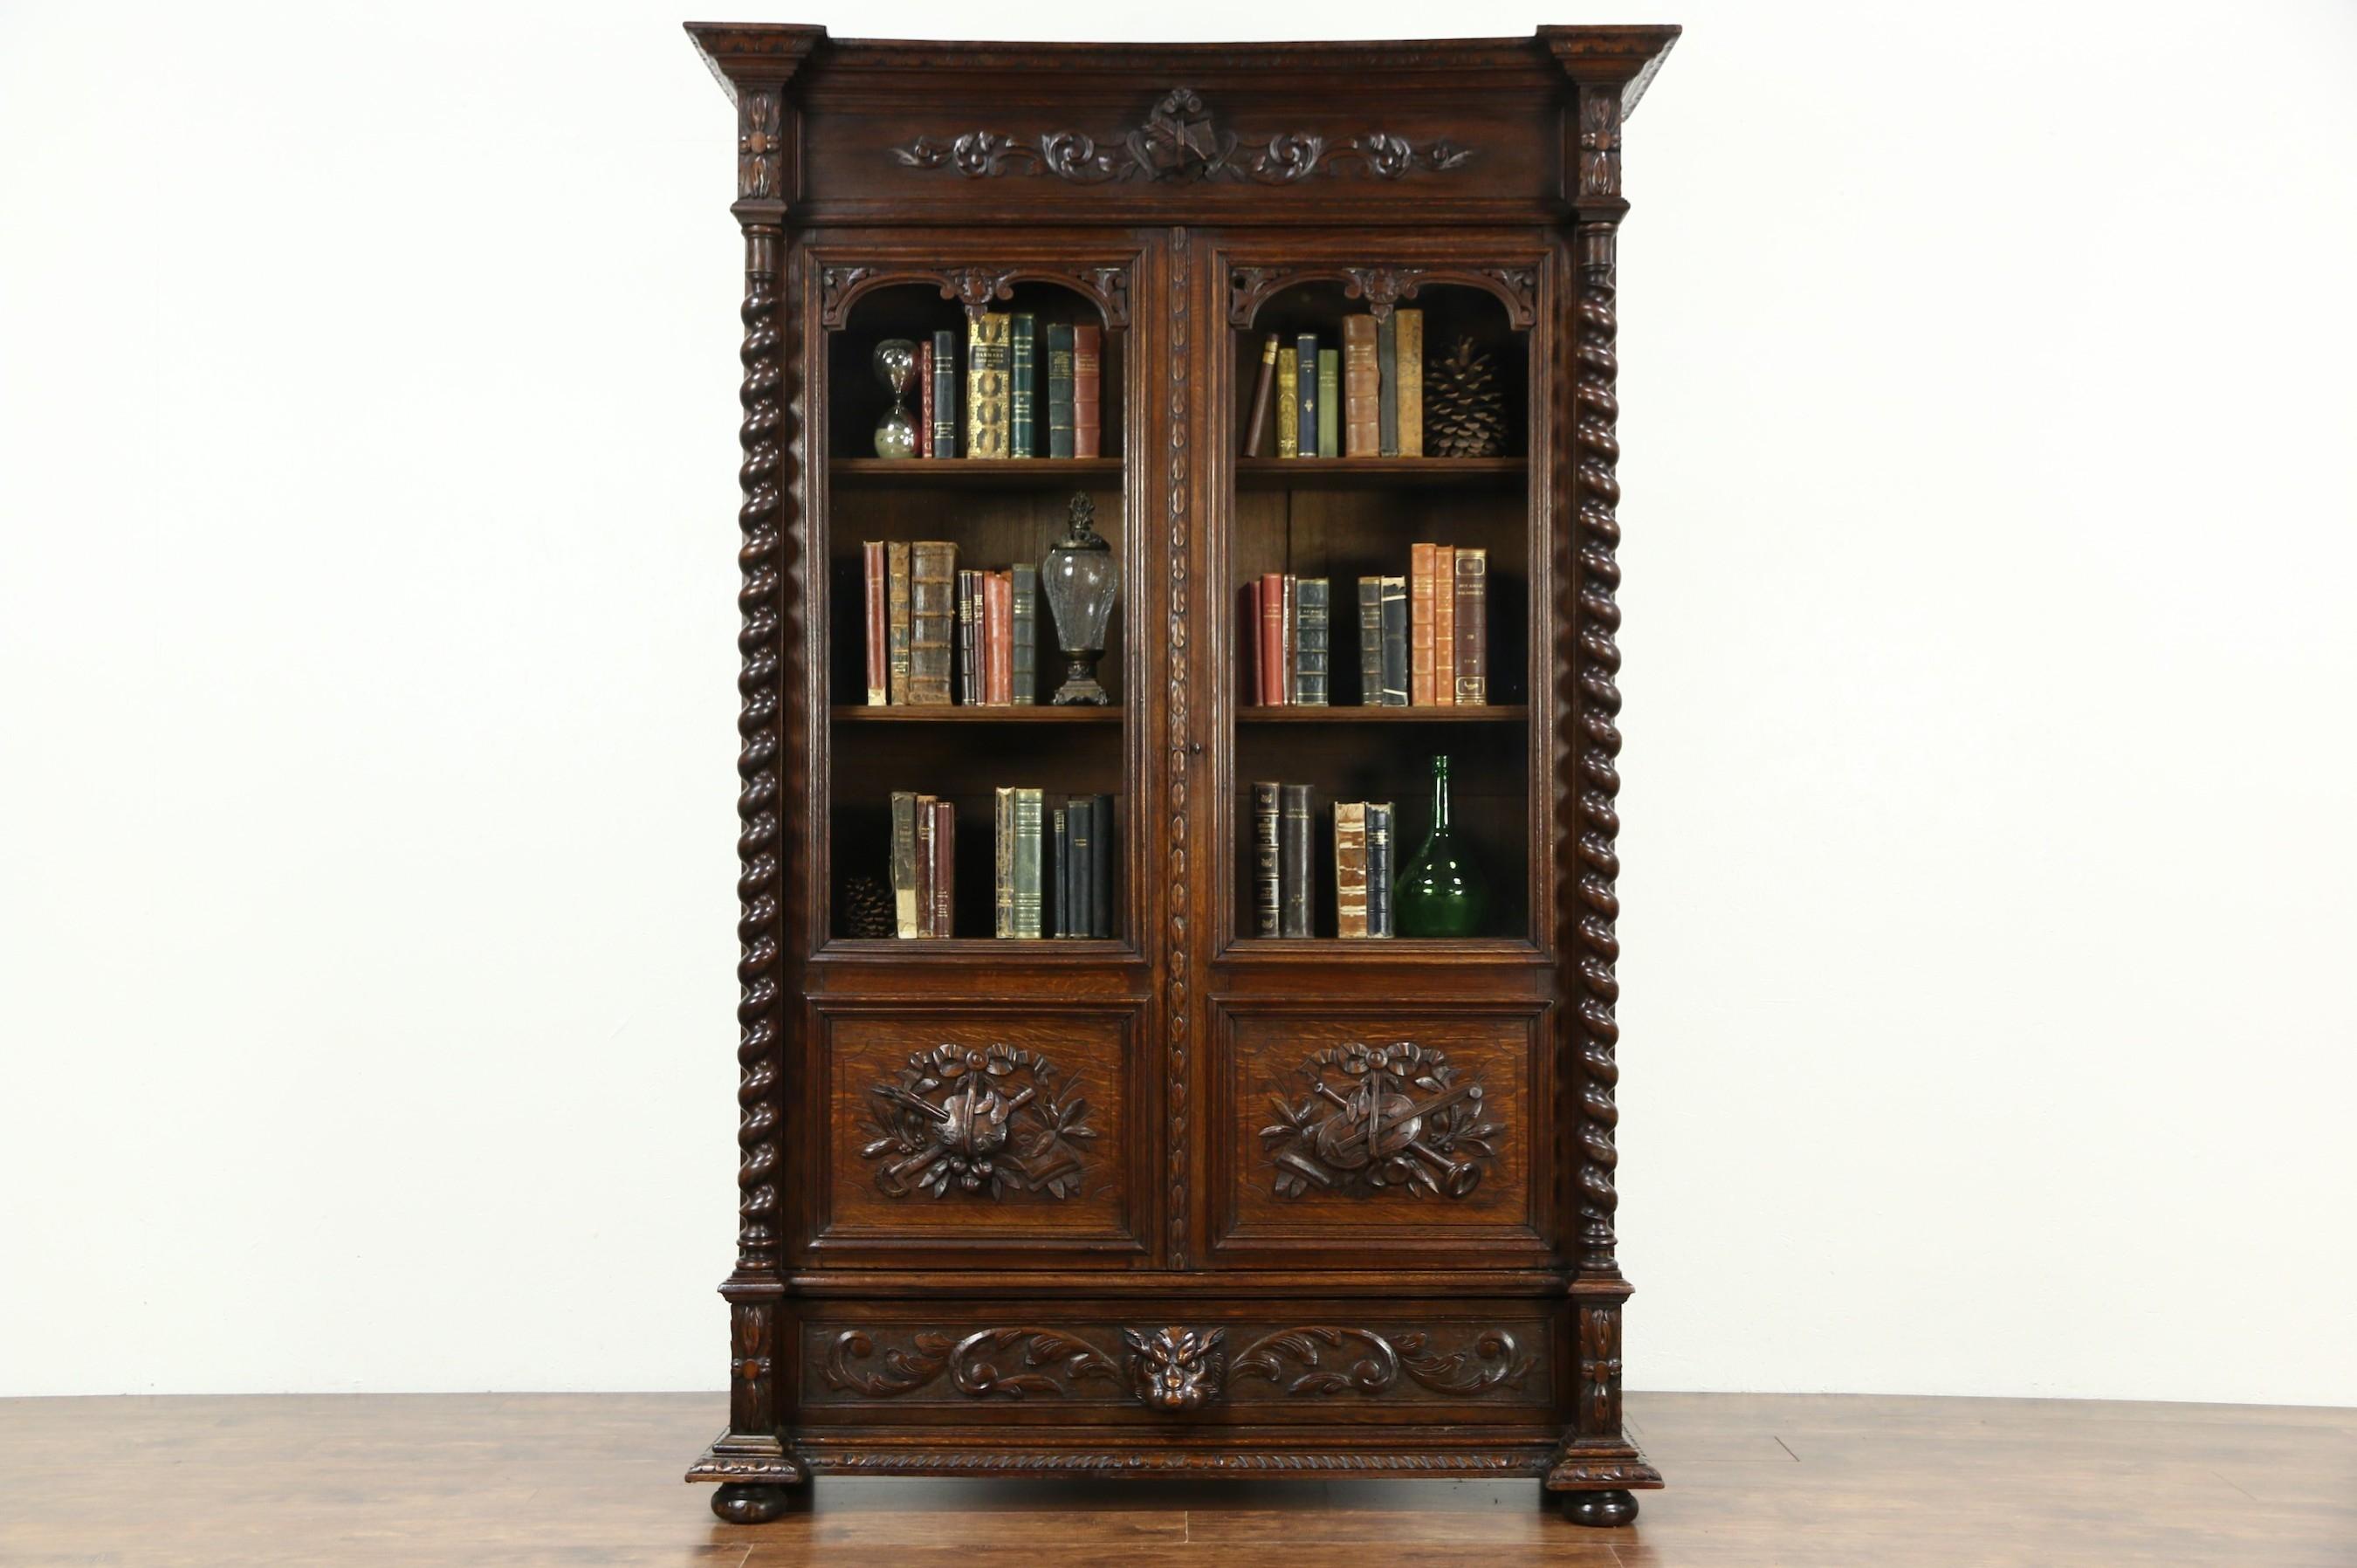 Black Forest Antique 1890 Oak Library Bookcase Carved Art Music Within Oak Library Bookcase (#4 of 15)